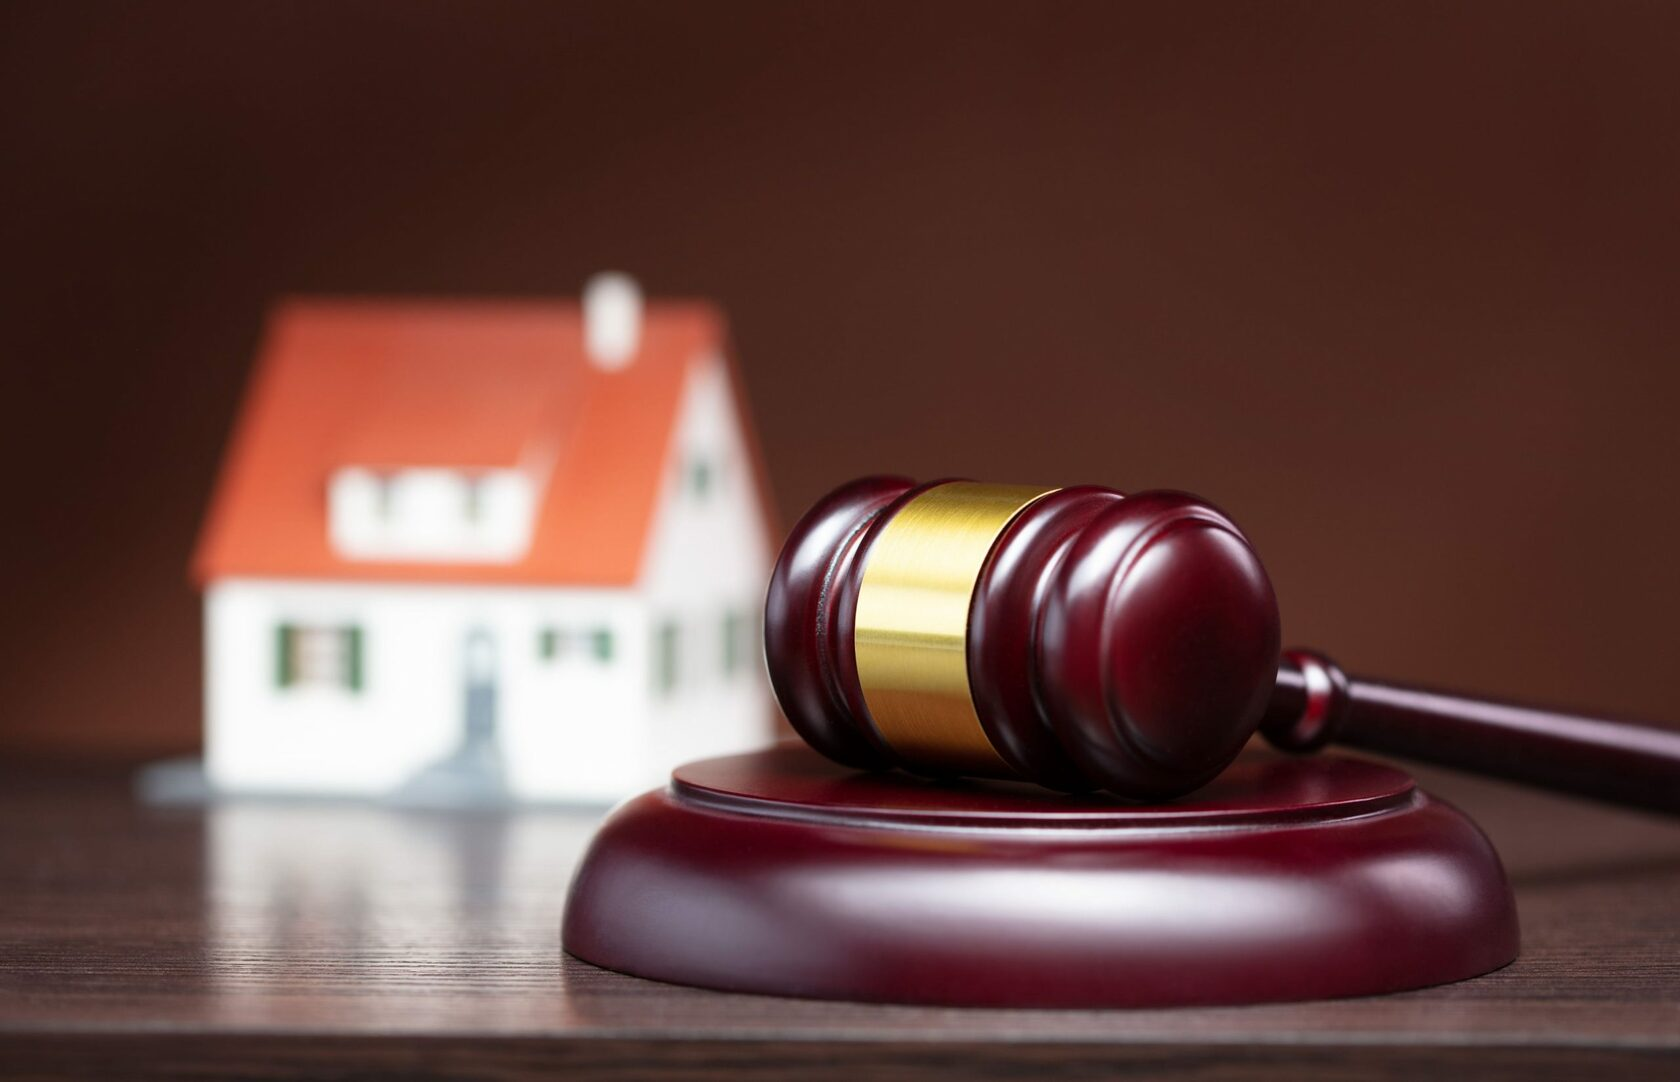 Наложили арест на имущество или счета: как действовать? Адвокат в Запорожье. Юридическое бюро Линия права